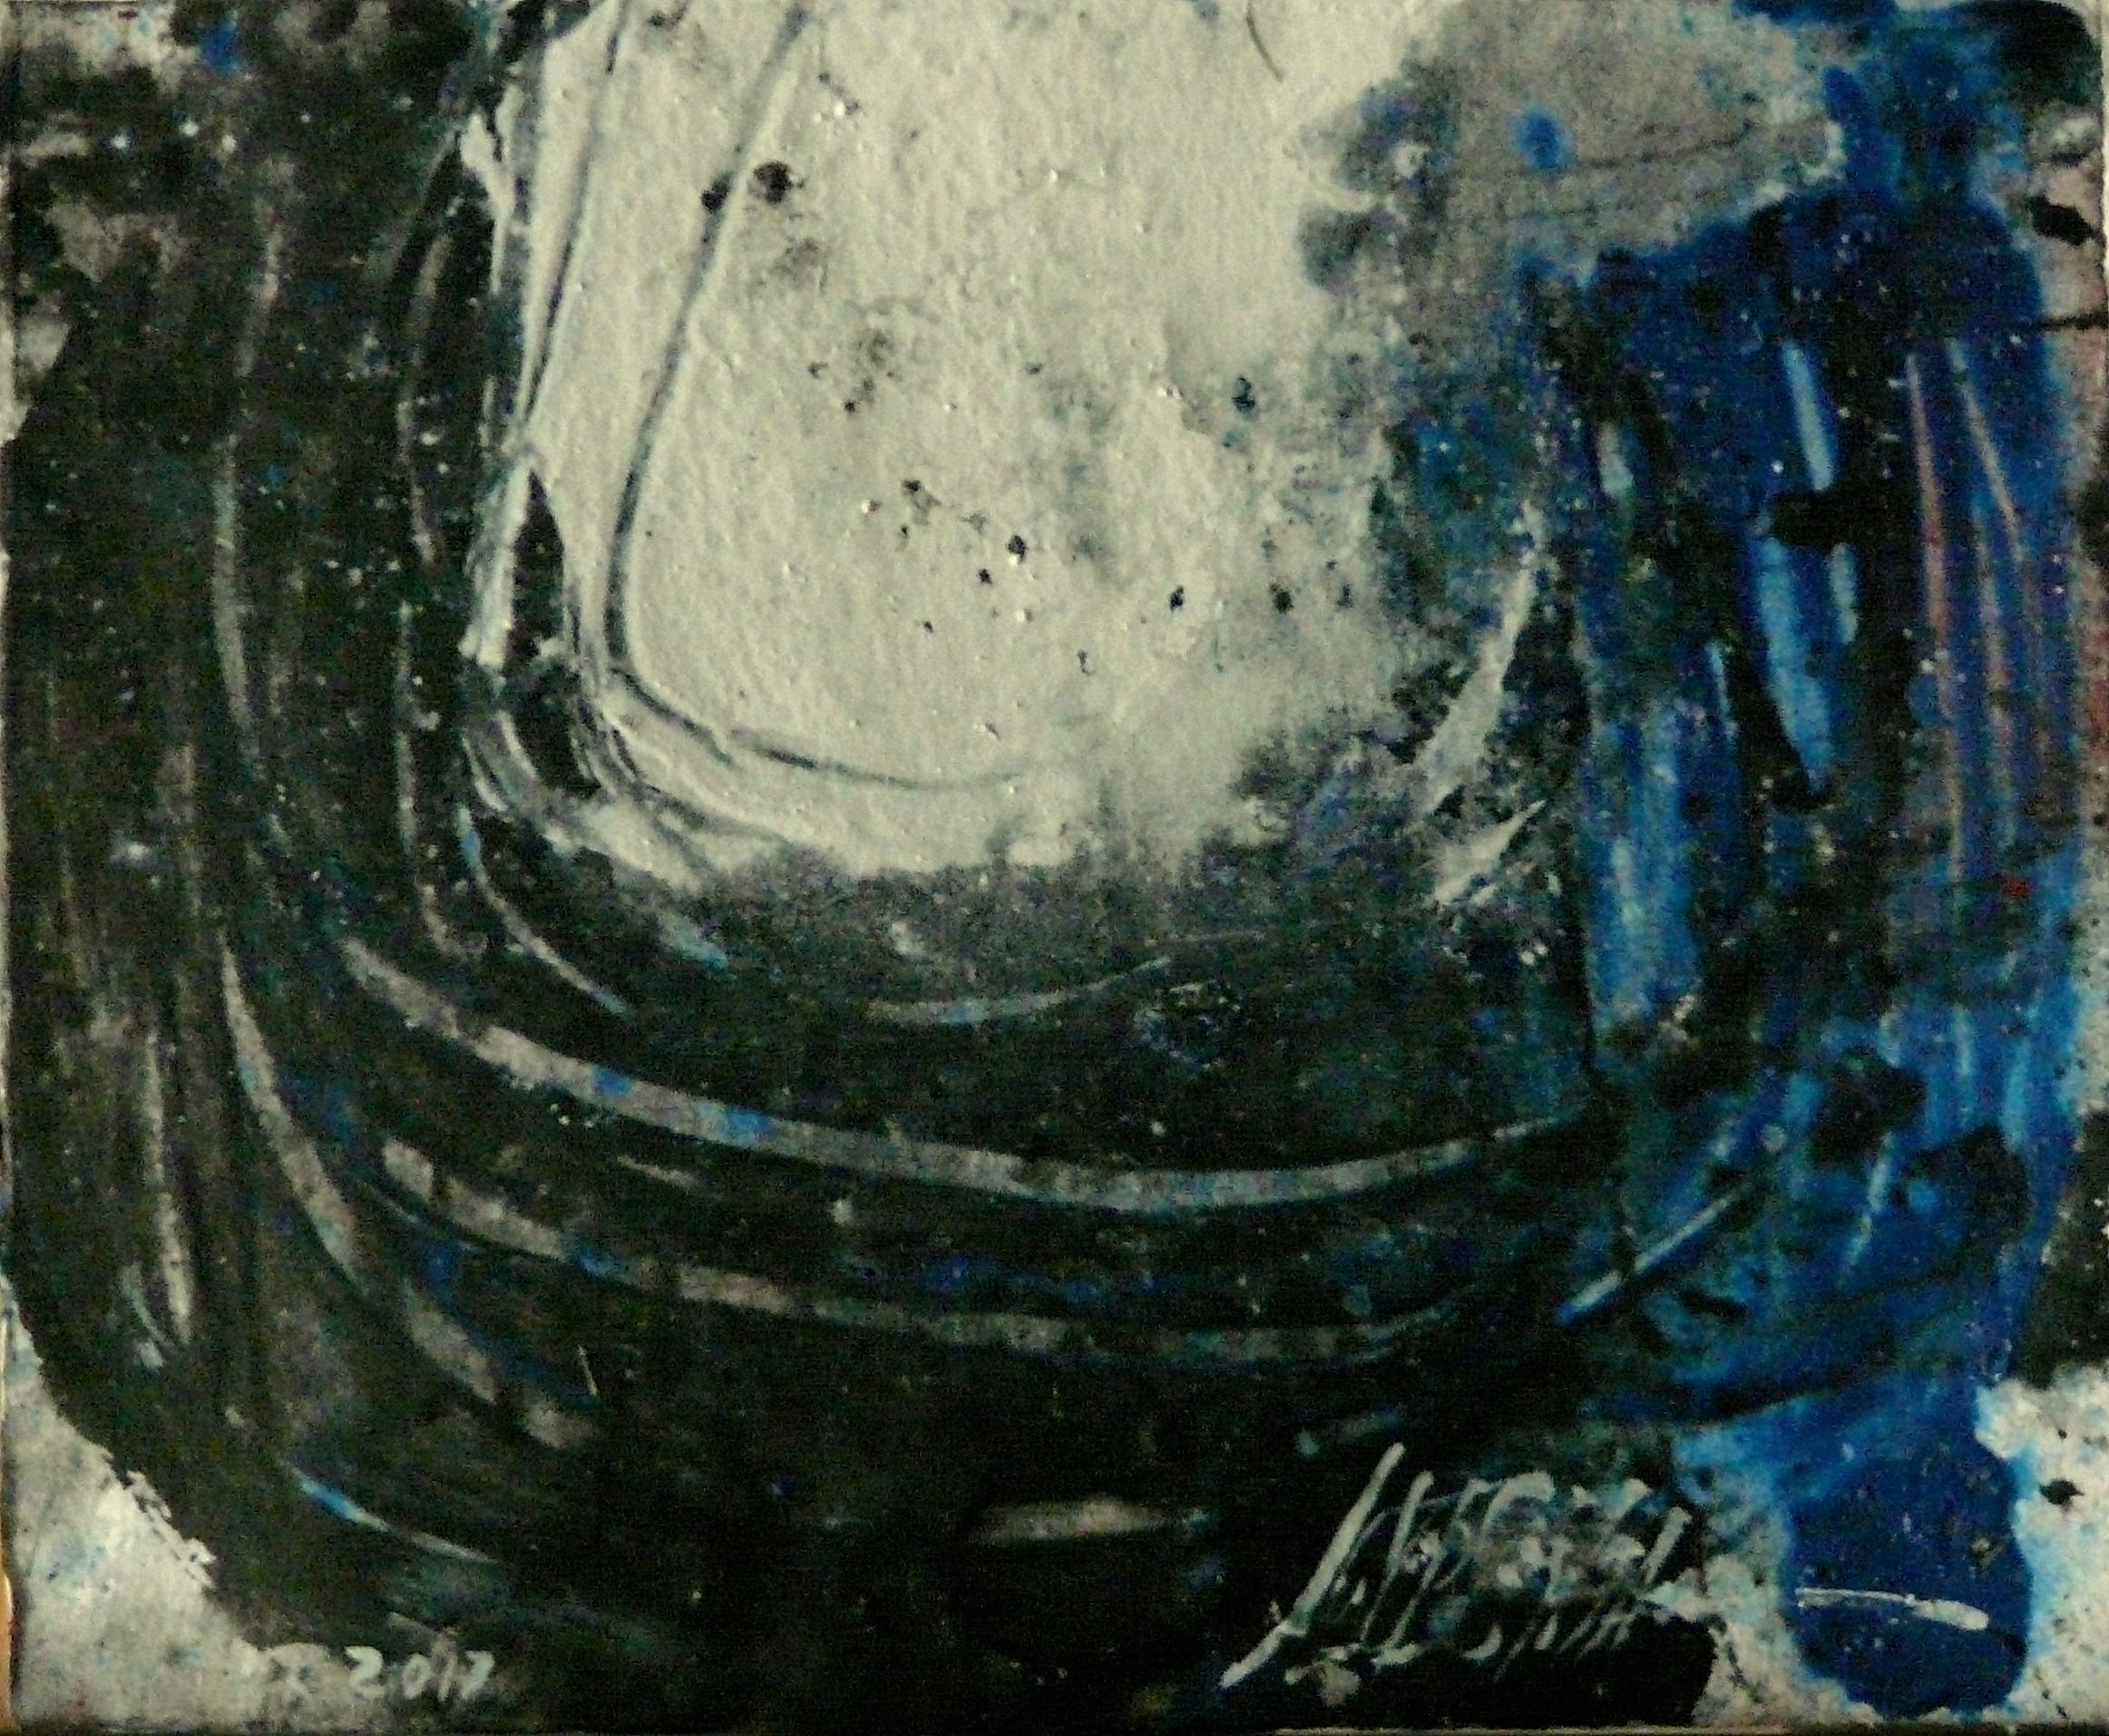 489 - Mixed technique on paper 19 x 22 cm 2017